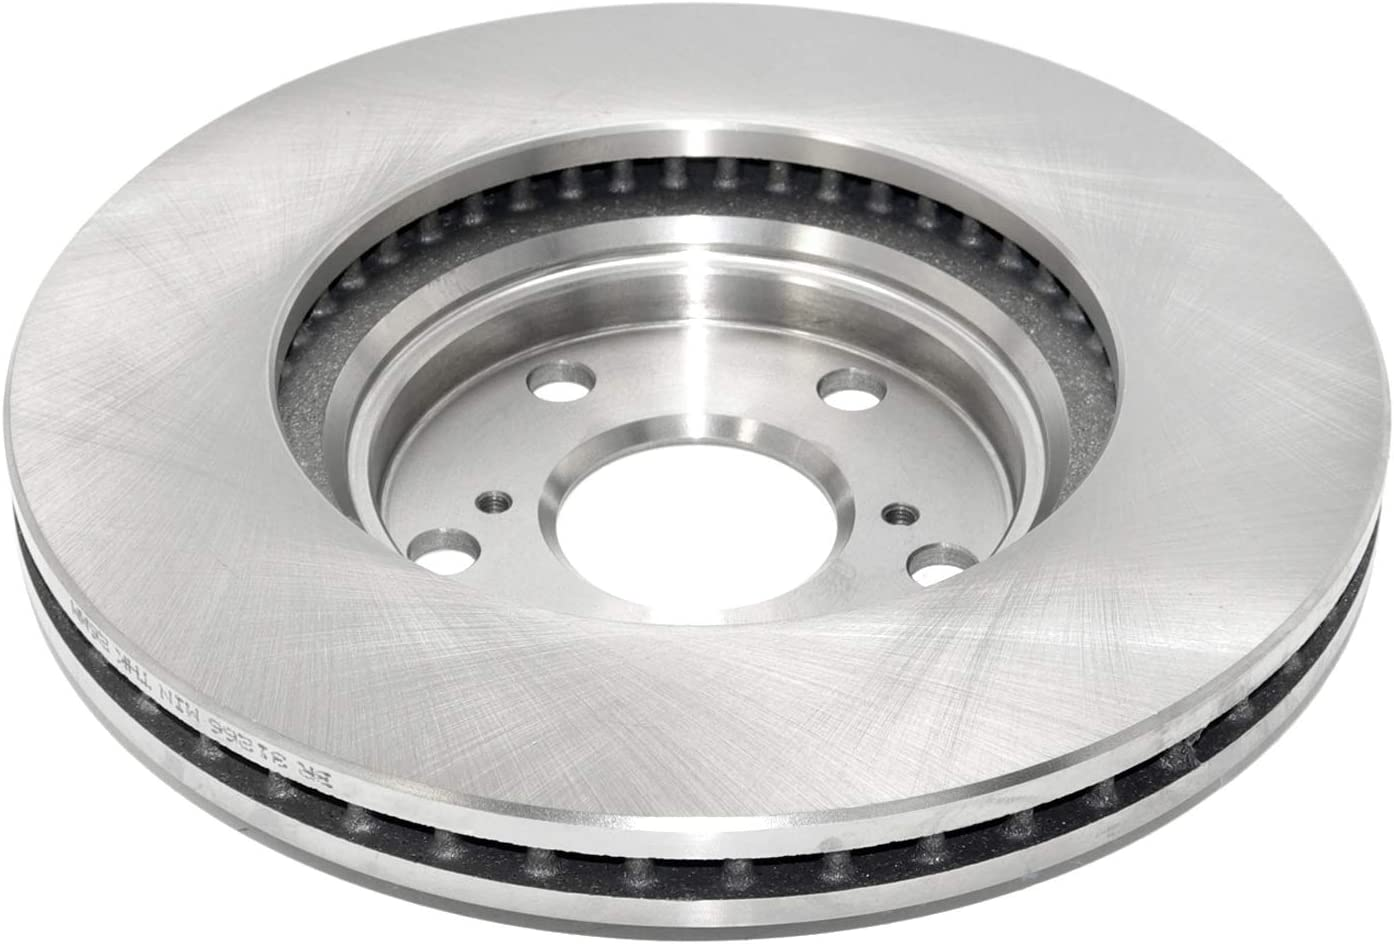 Dura International BR31266 Front Vented Disc Brake Rotor